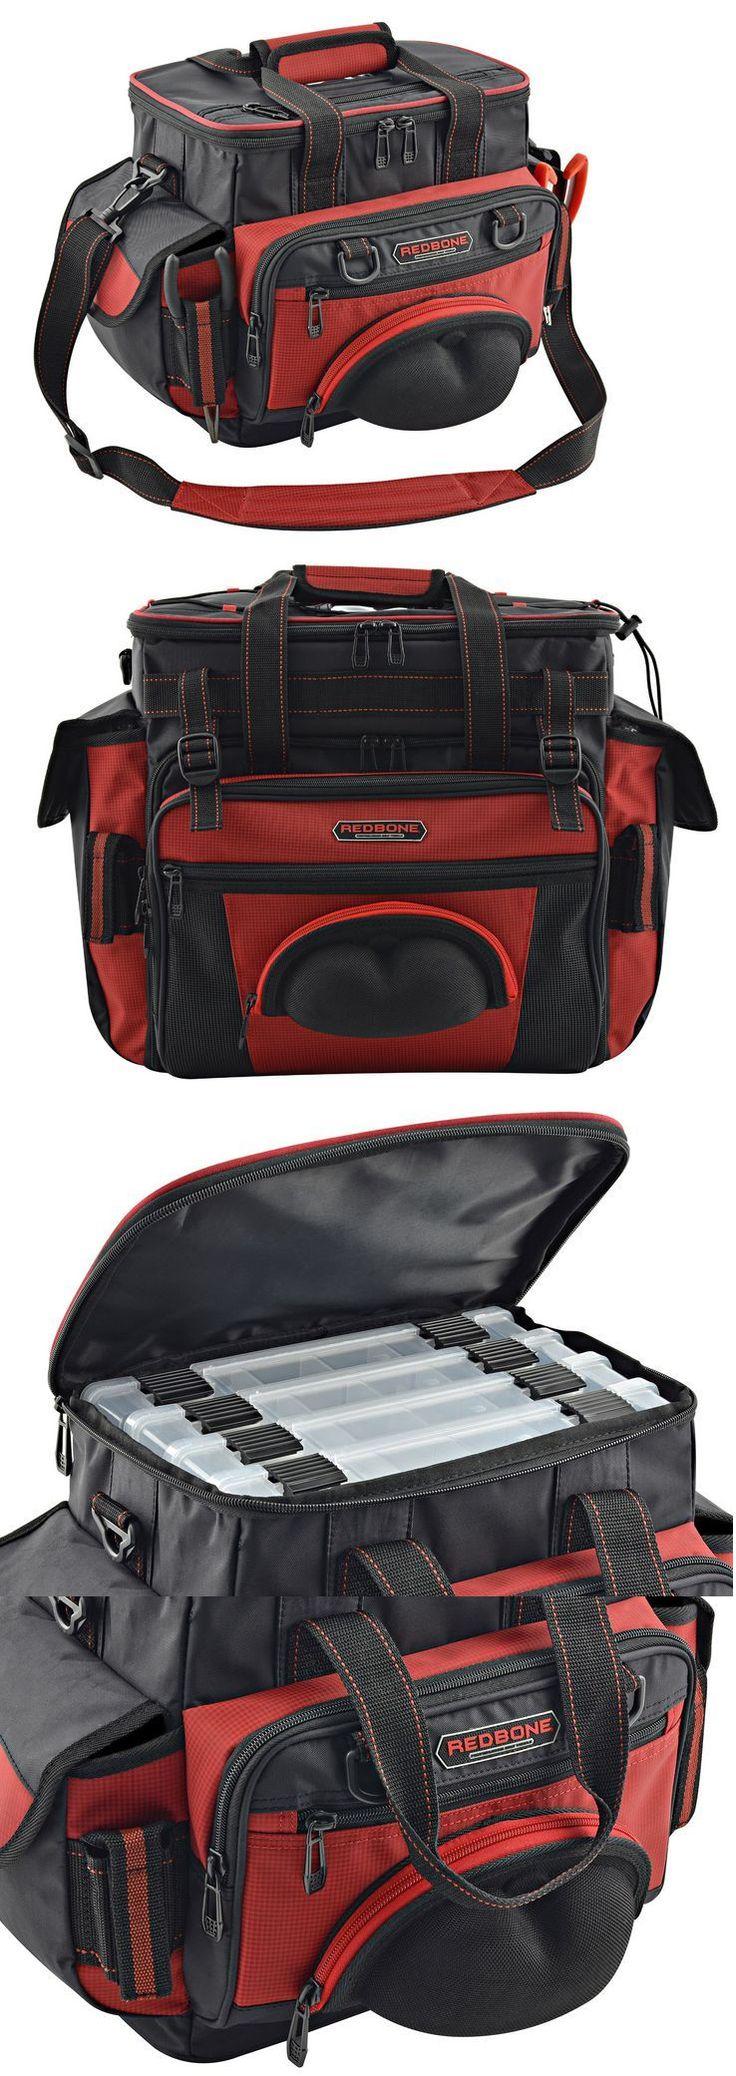 Fishing tackle craft supplies - Tackle Boxes And Bags 22696 Medium Soft Sided Fishing Tackle Bag Box W